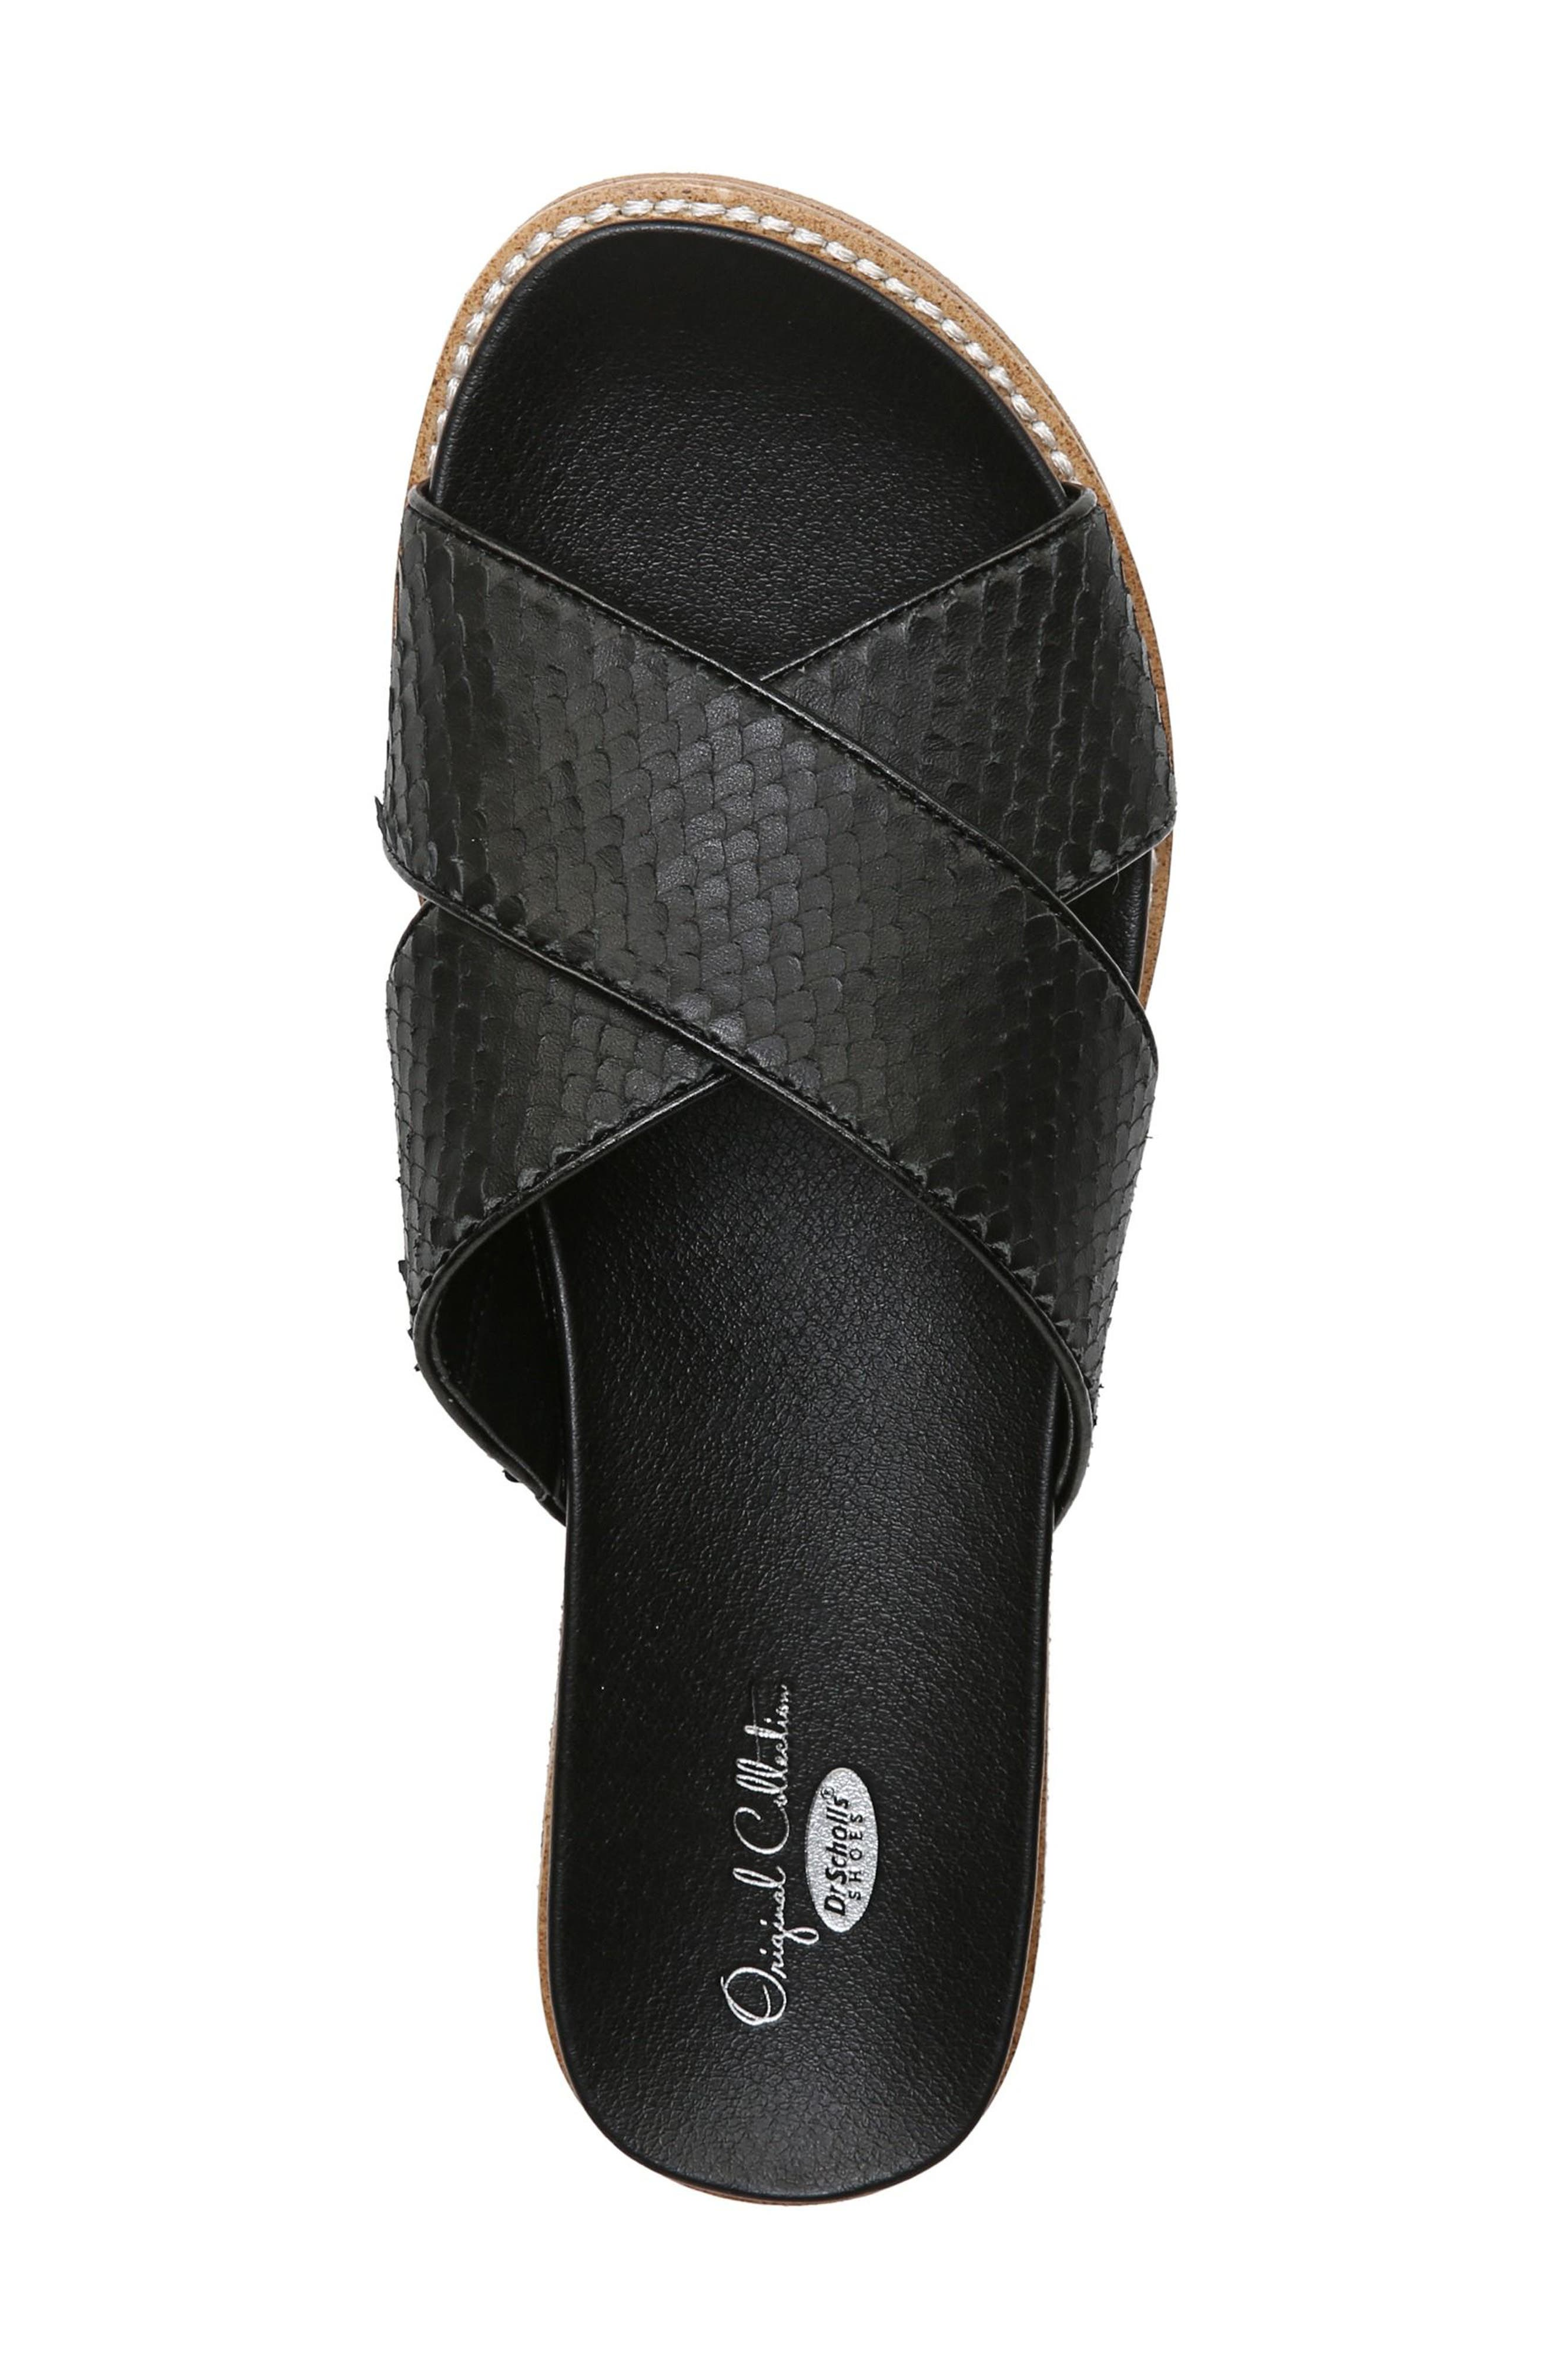 DR. SCHOLL'S, Deco Slide Sandal, Alternate thumbnail 5, color, BLACK LEATHER